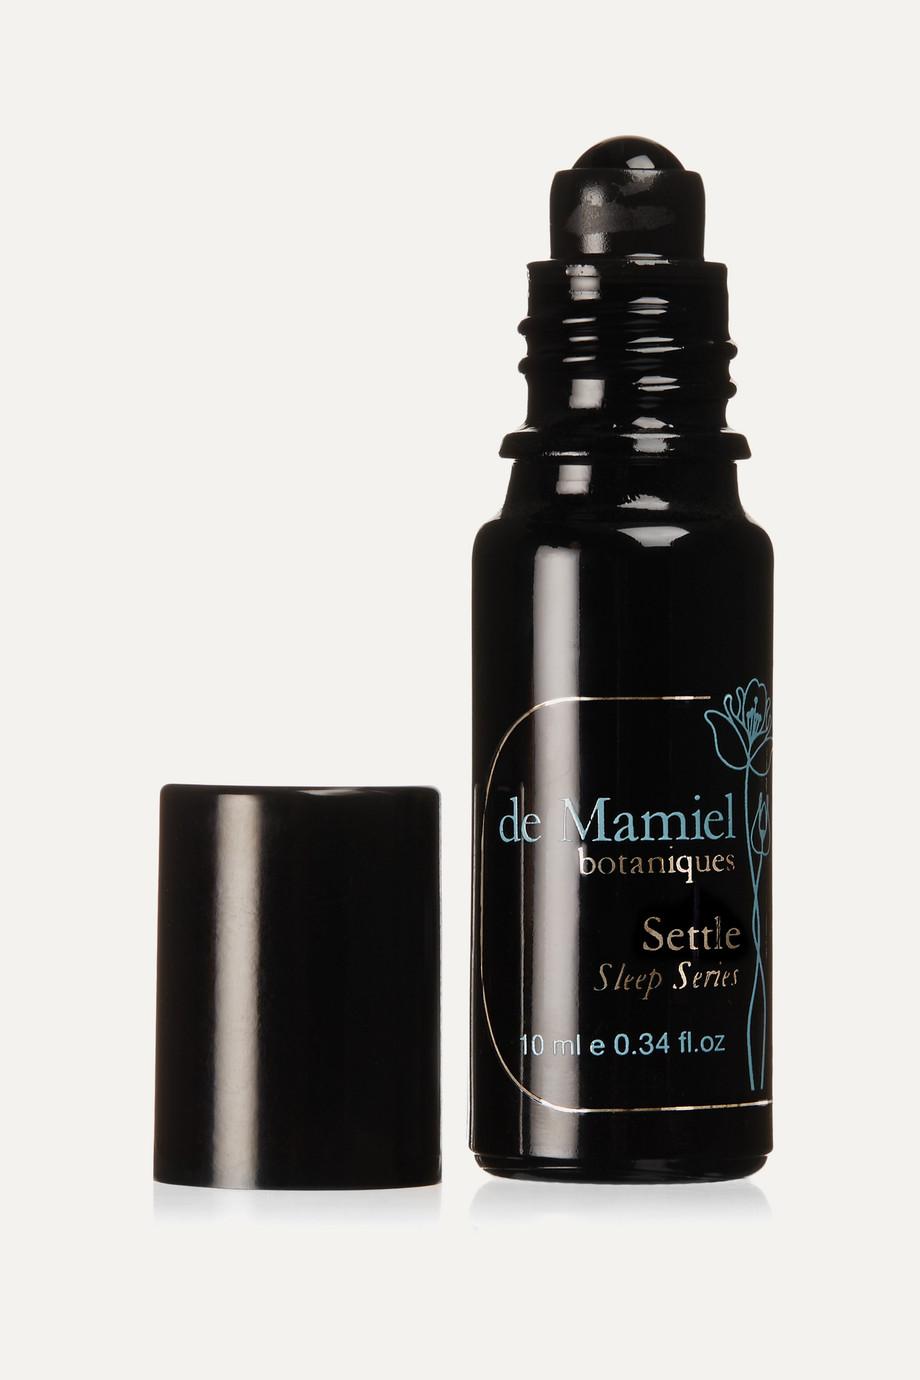 de Mamiel Sleep Series - Settle, 10ml